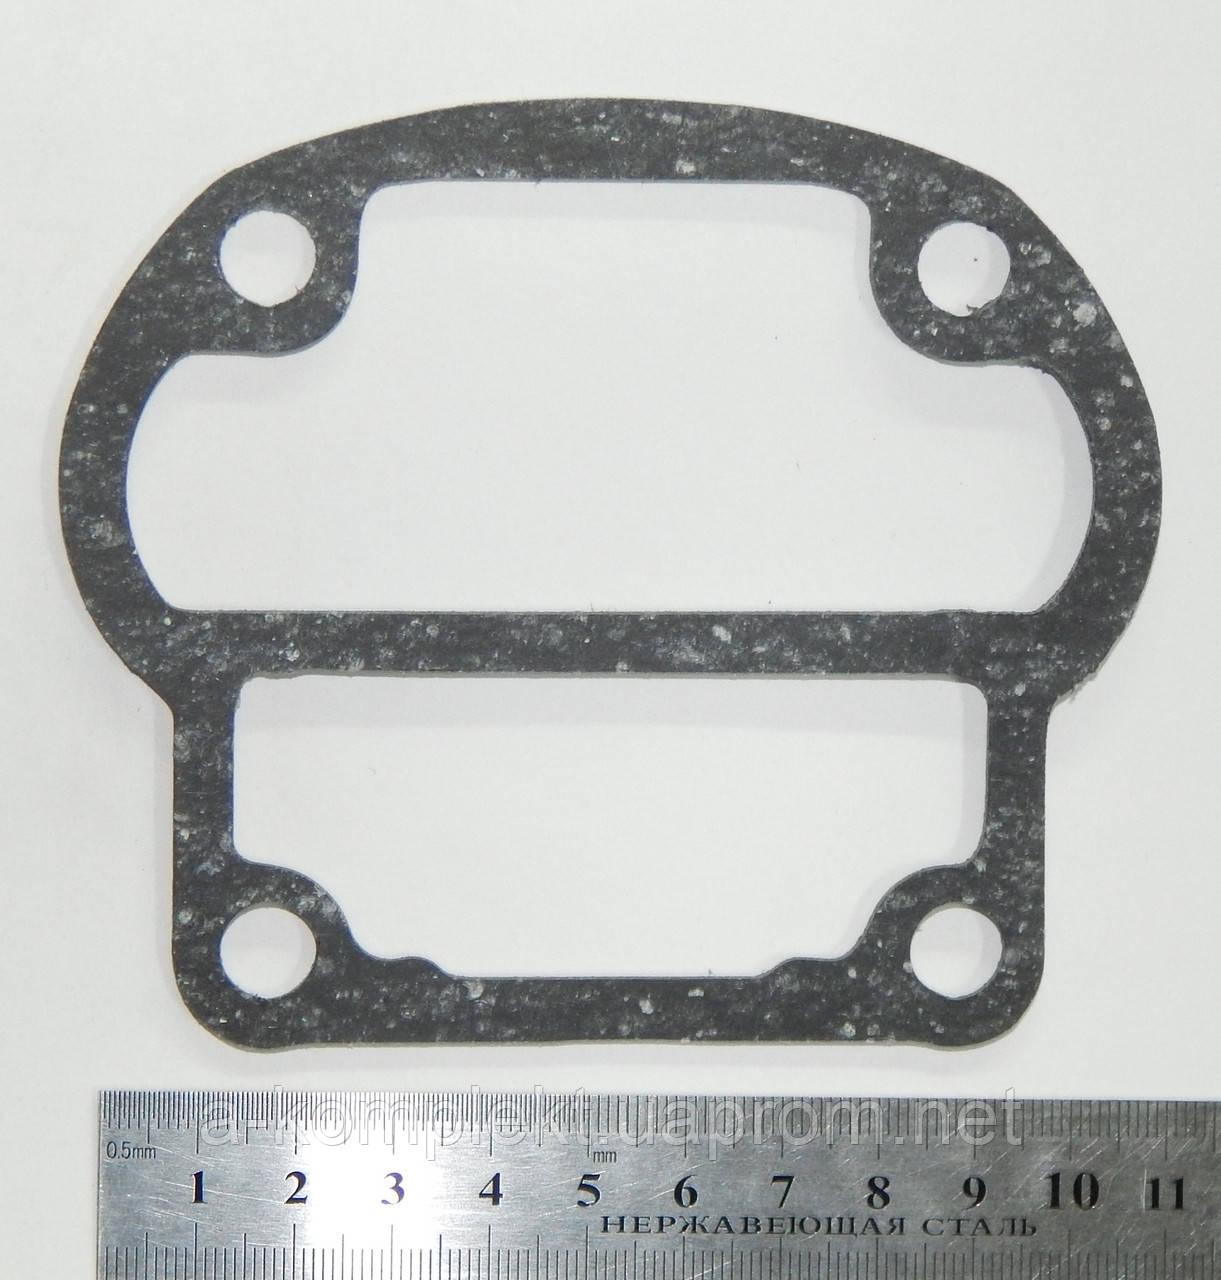 Прокладка воздушной головки компрессора МТЗ, ЗИЛ (грибок)